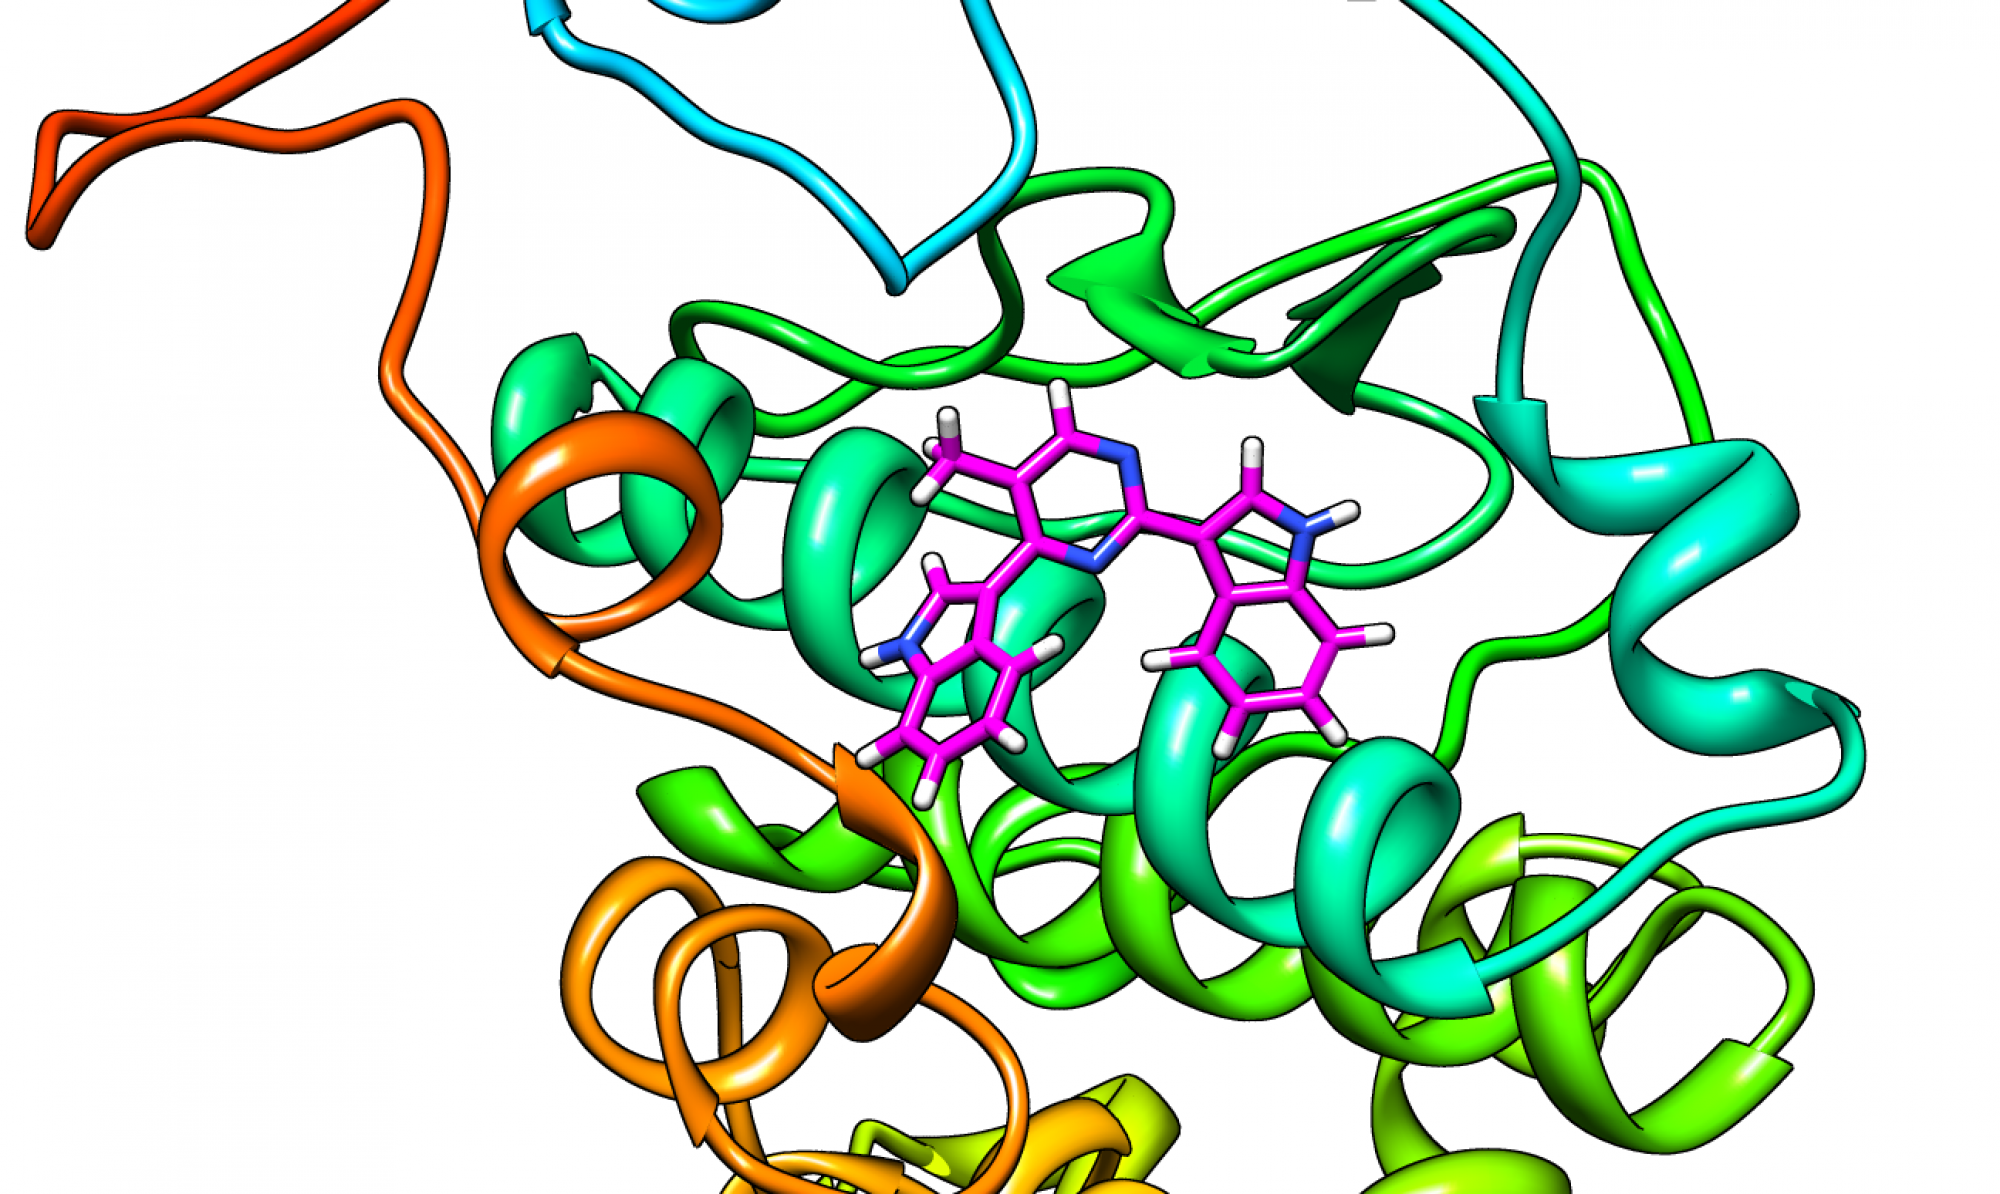 Computational Biomolecular Engineering Lab